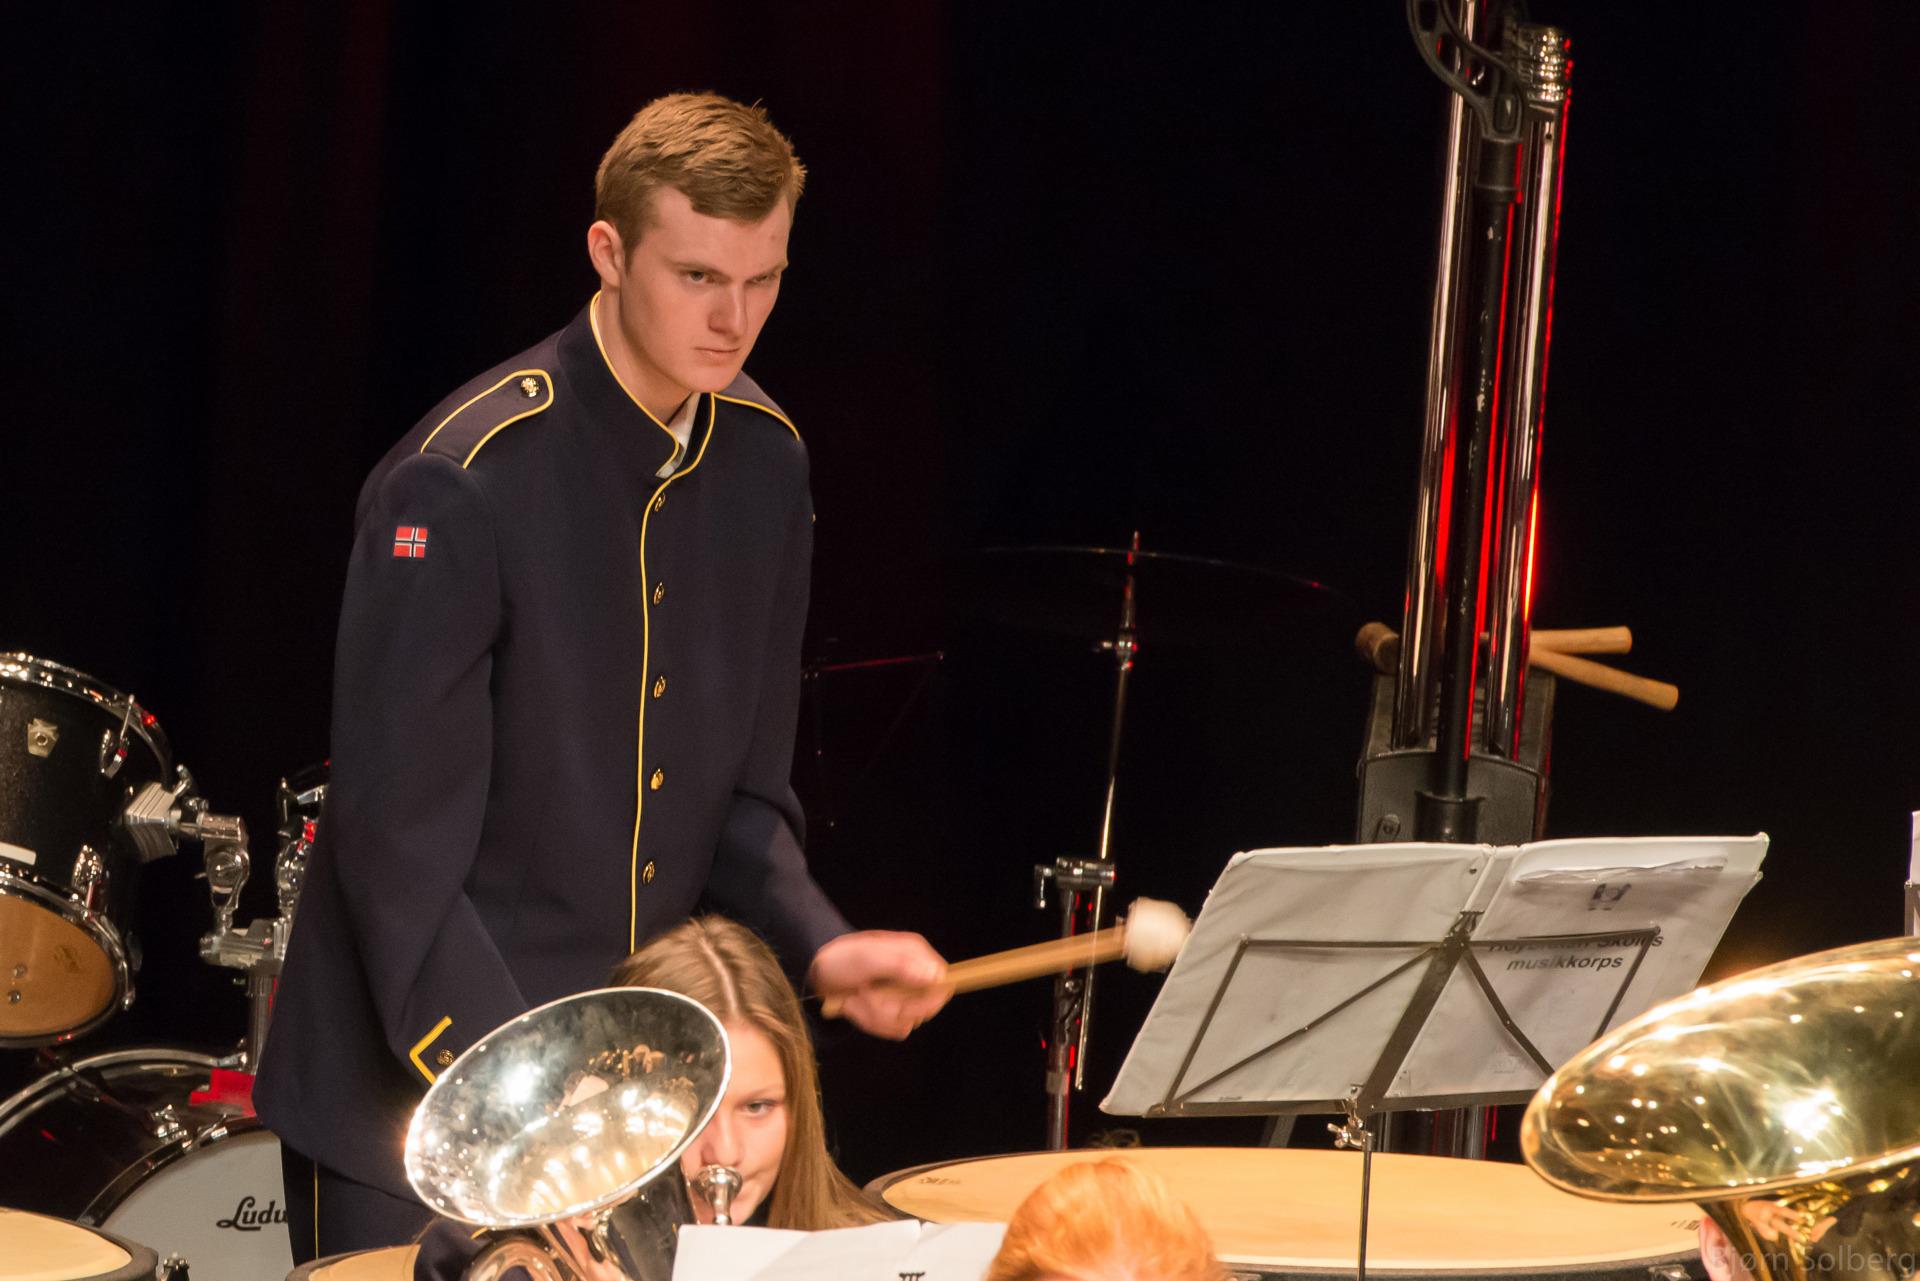 20140316-HSMK, mesterskap i Asker 2014-03-16 025.J